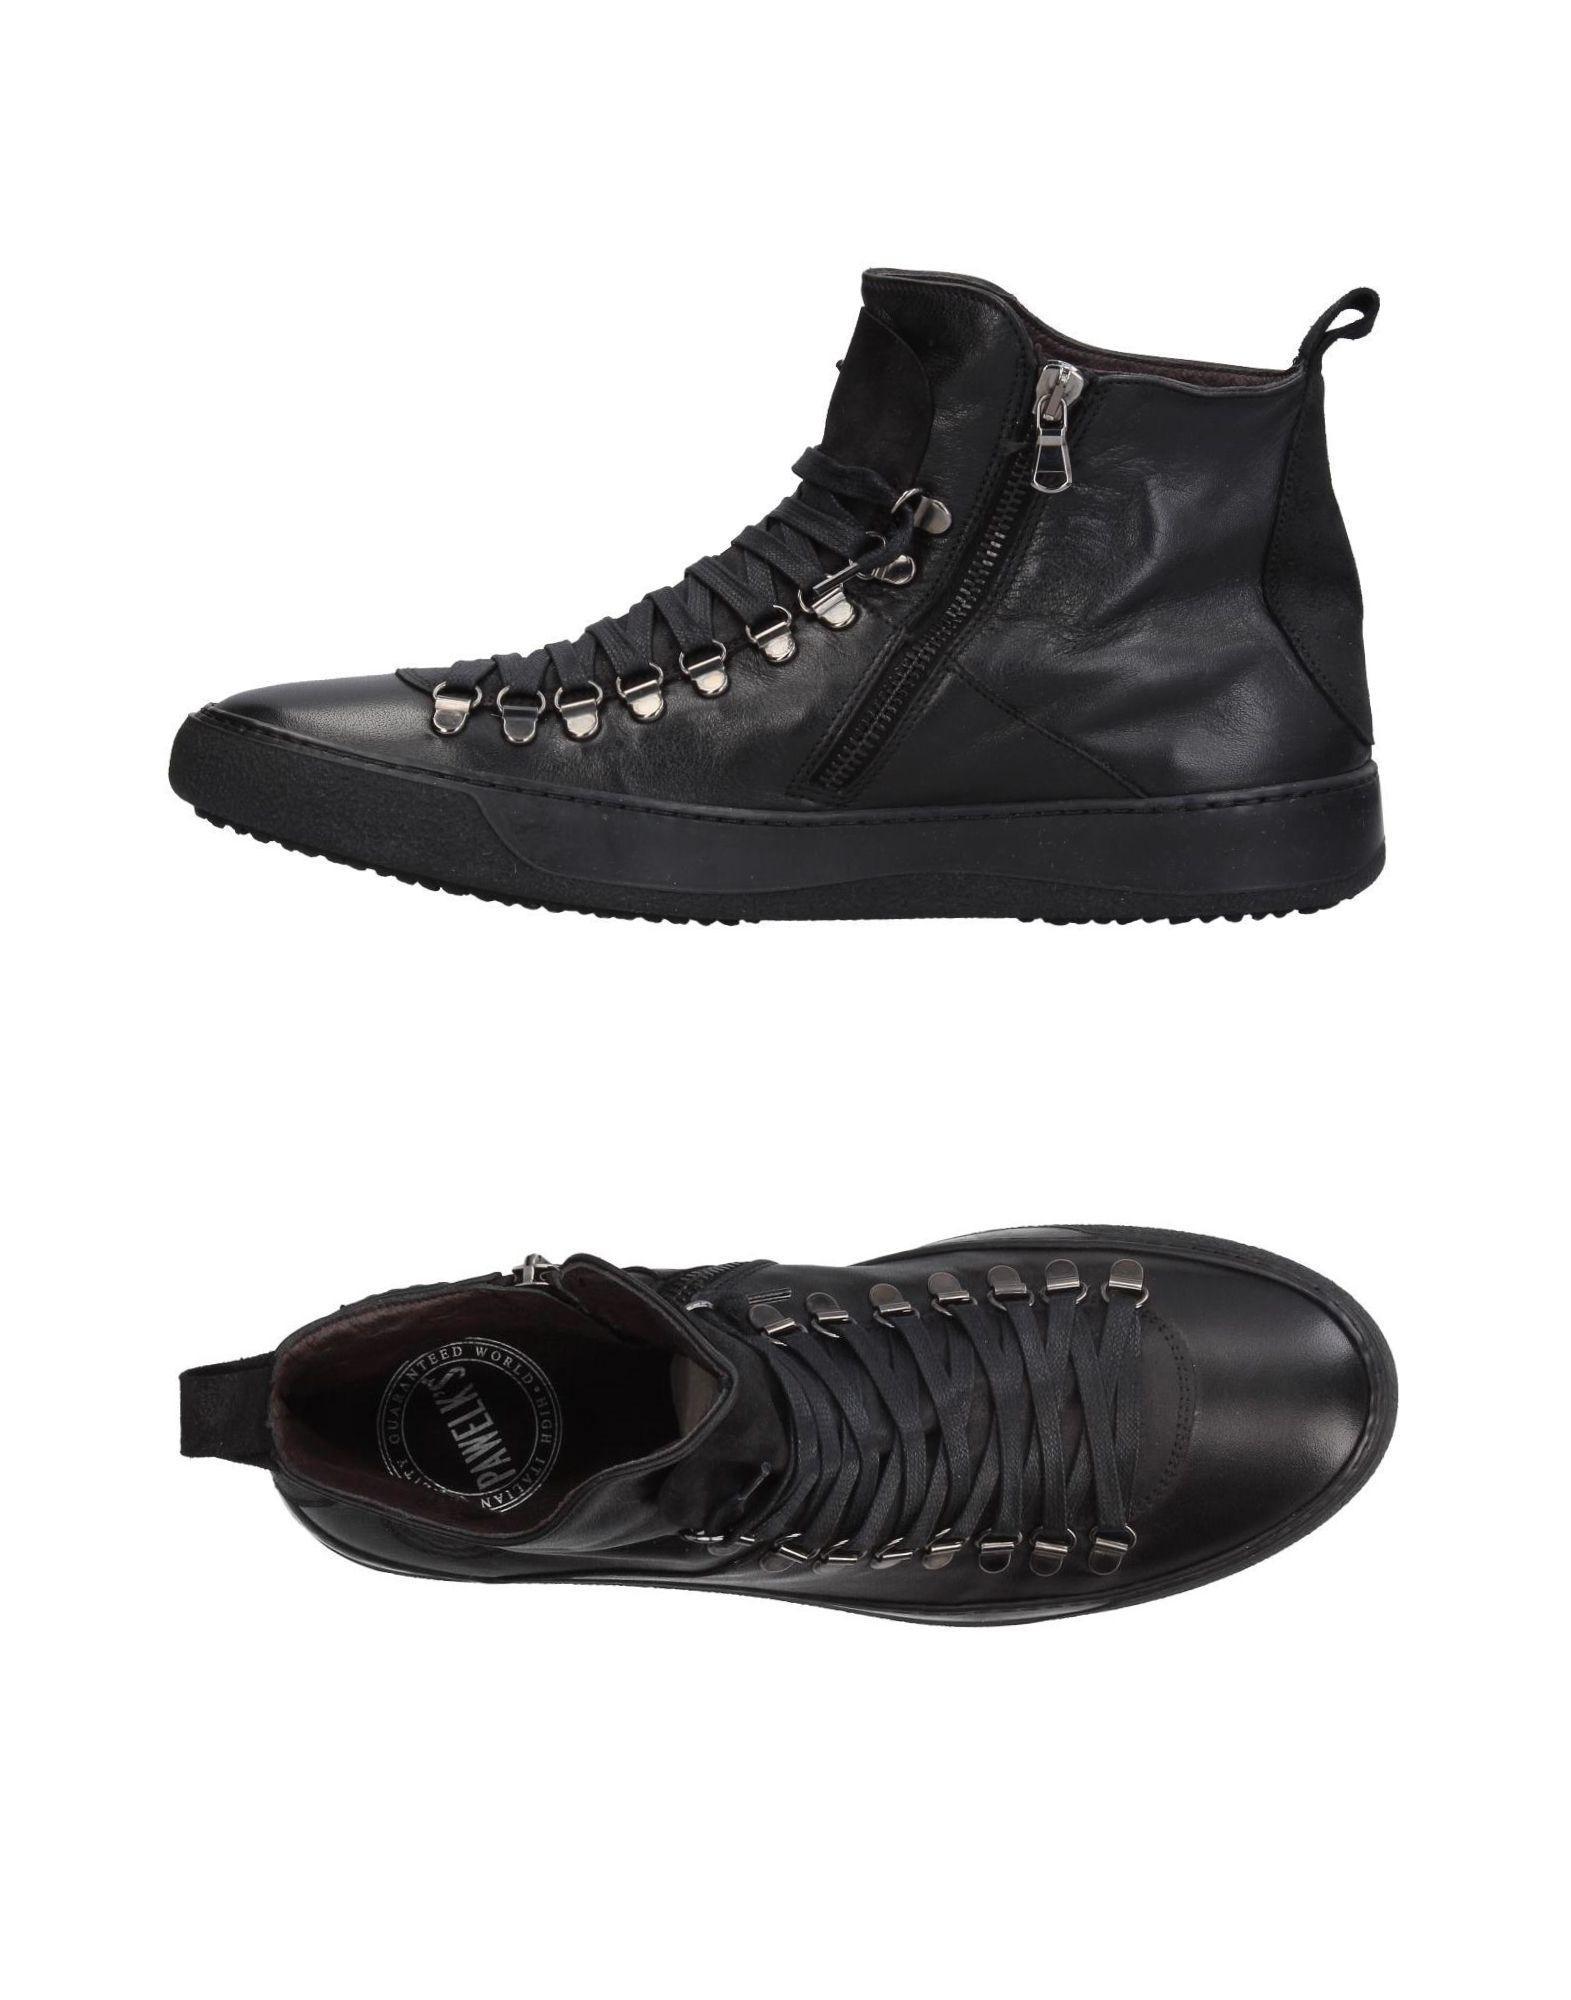 Pawelk De Haute-tops Et Chaussures De Sport ass8cM